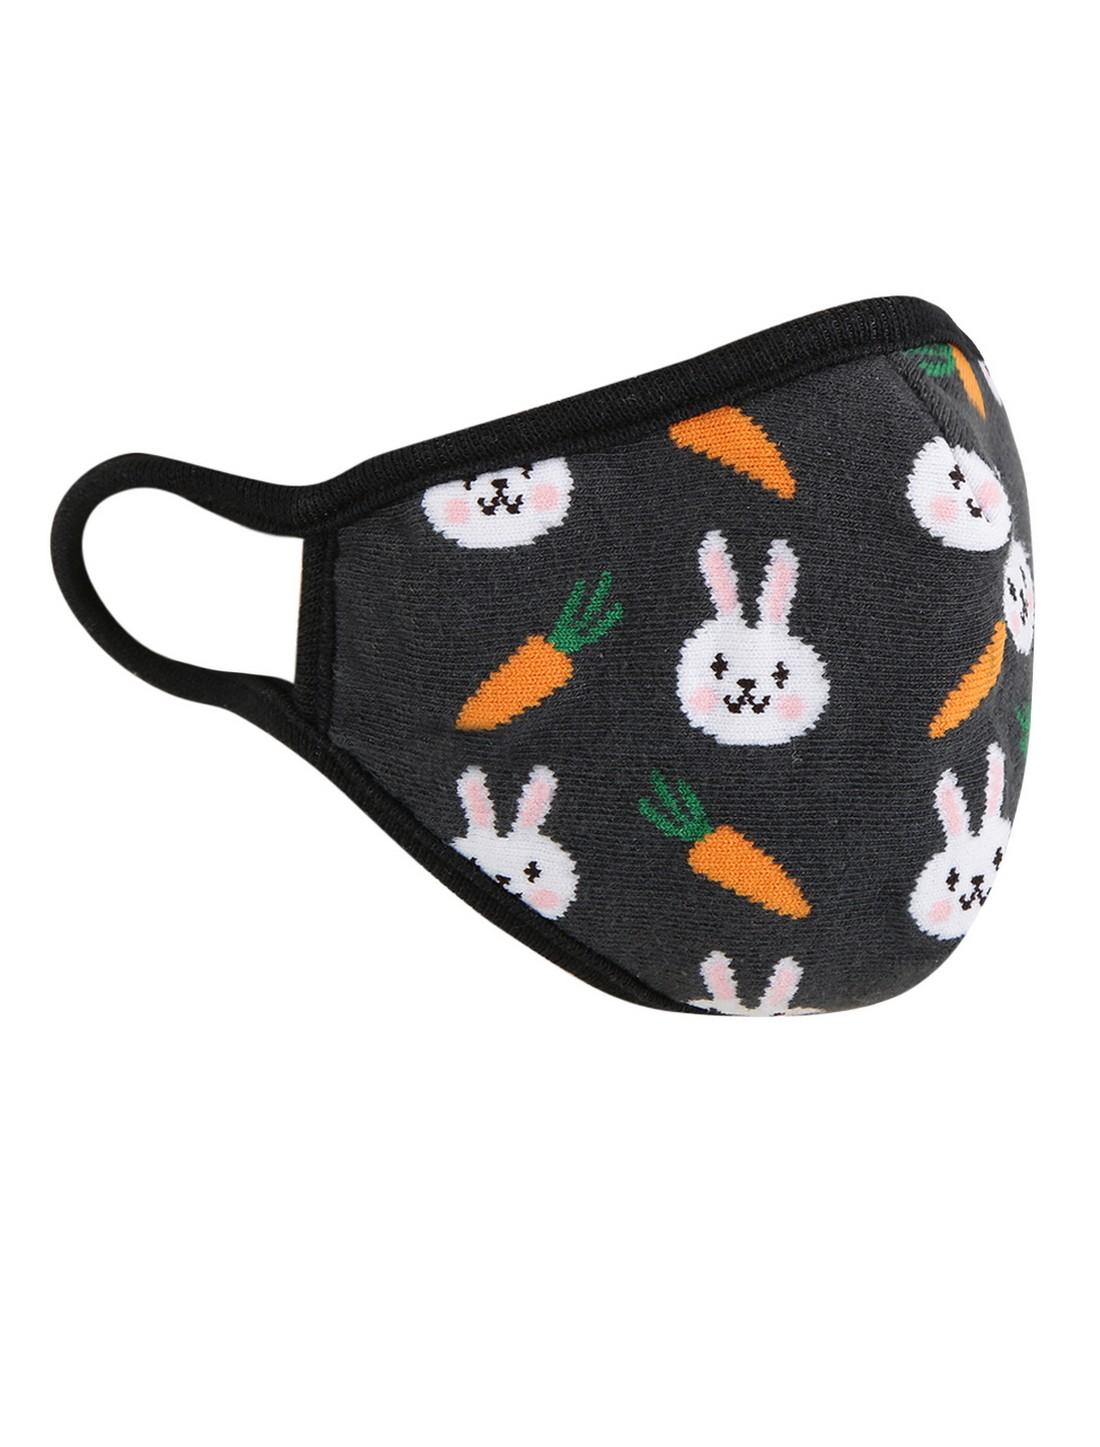 Soxytoes | Soxytoes Grey Bunny Stylish Protective Super Safe Washable Knitted Cotton Kid's Face Mask